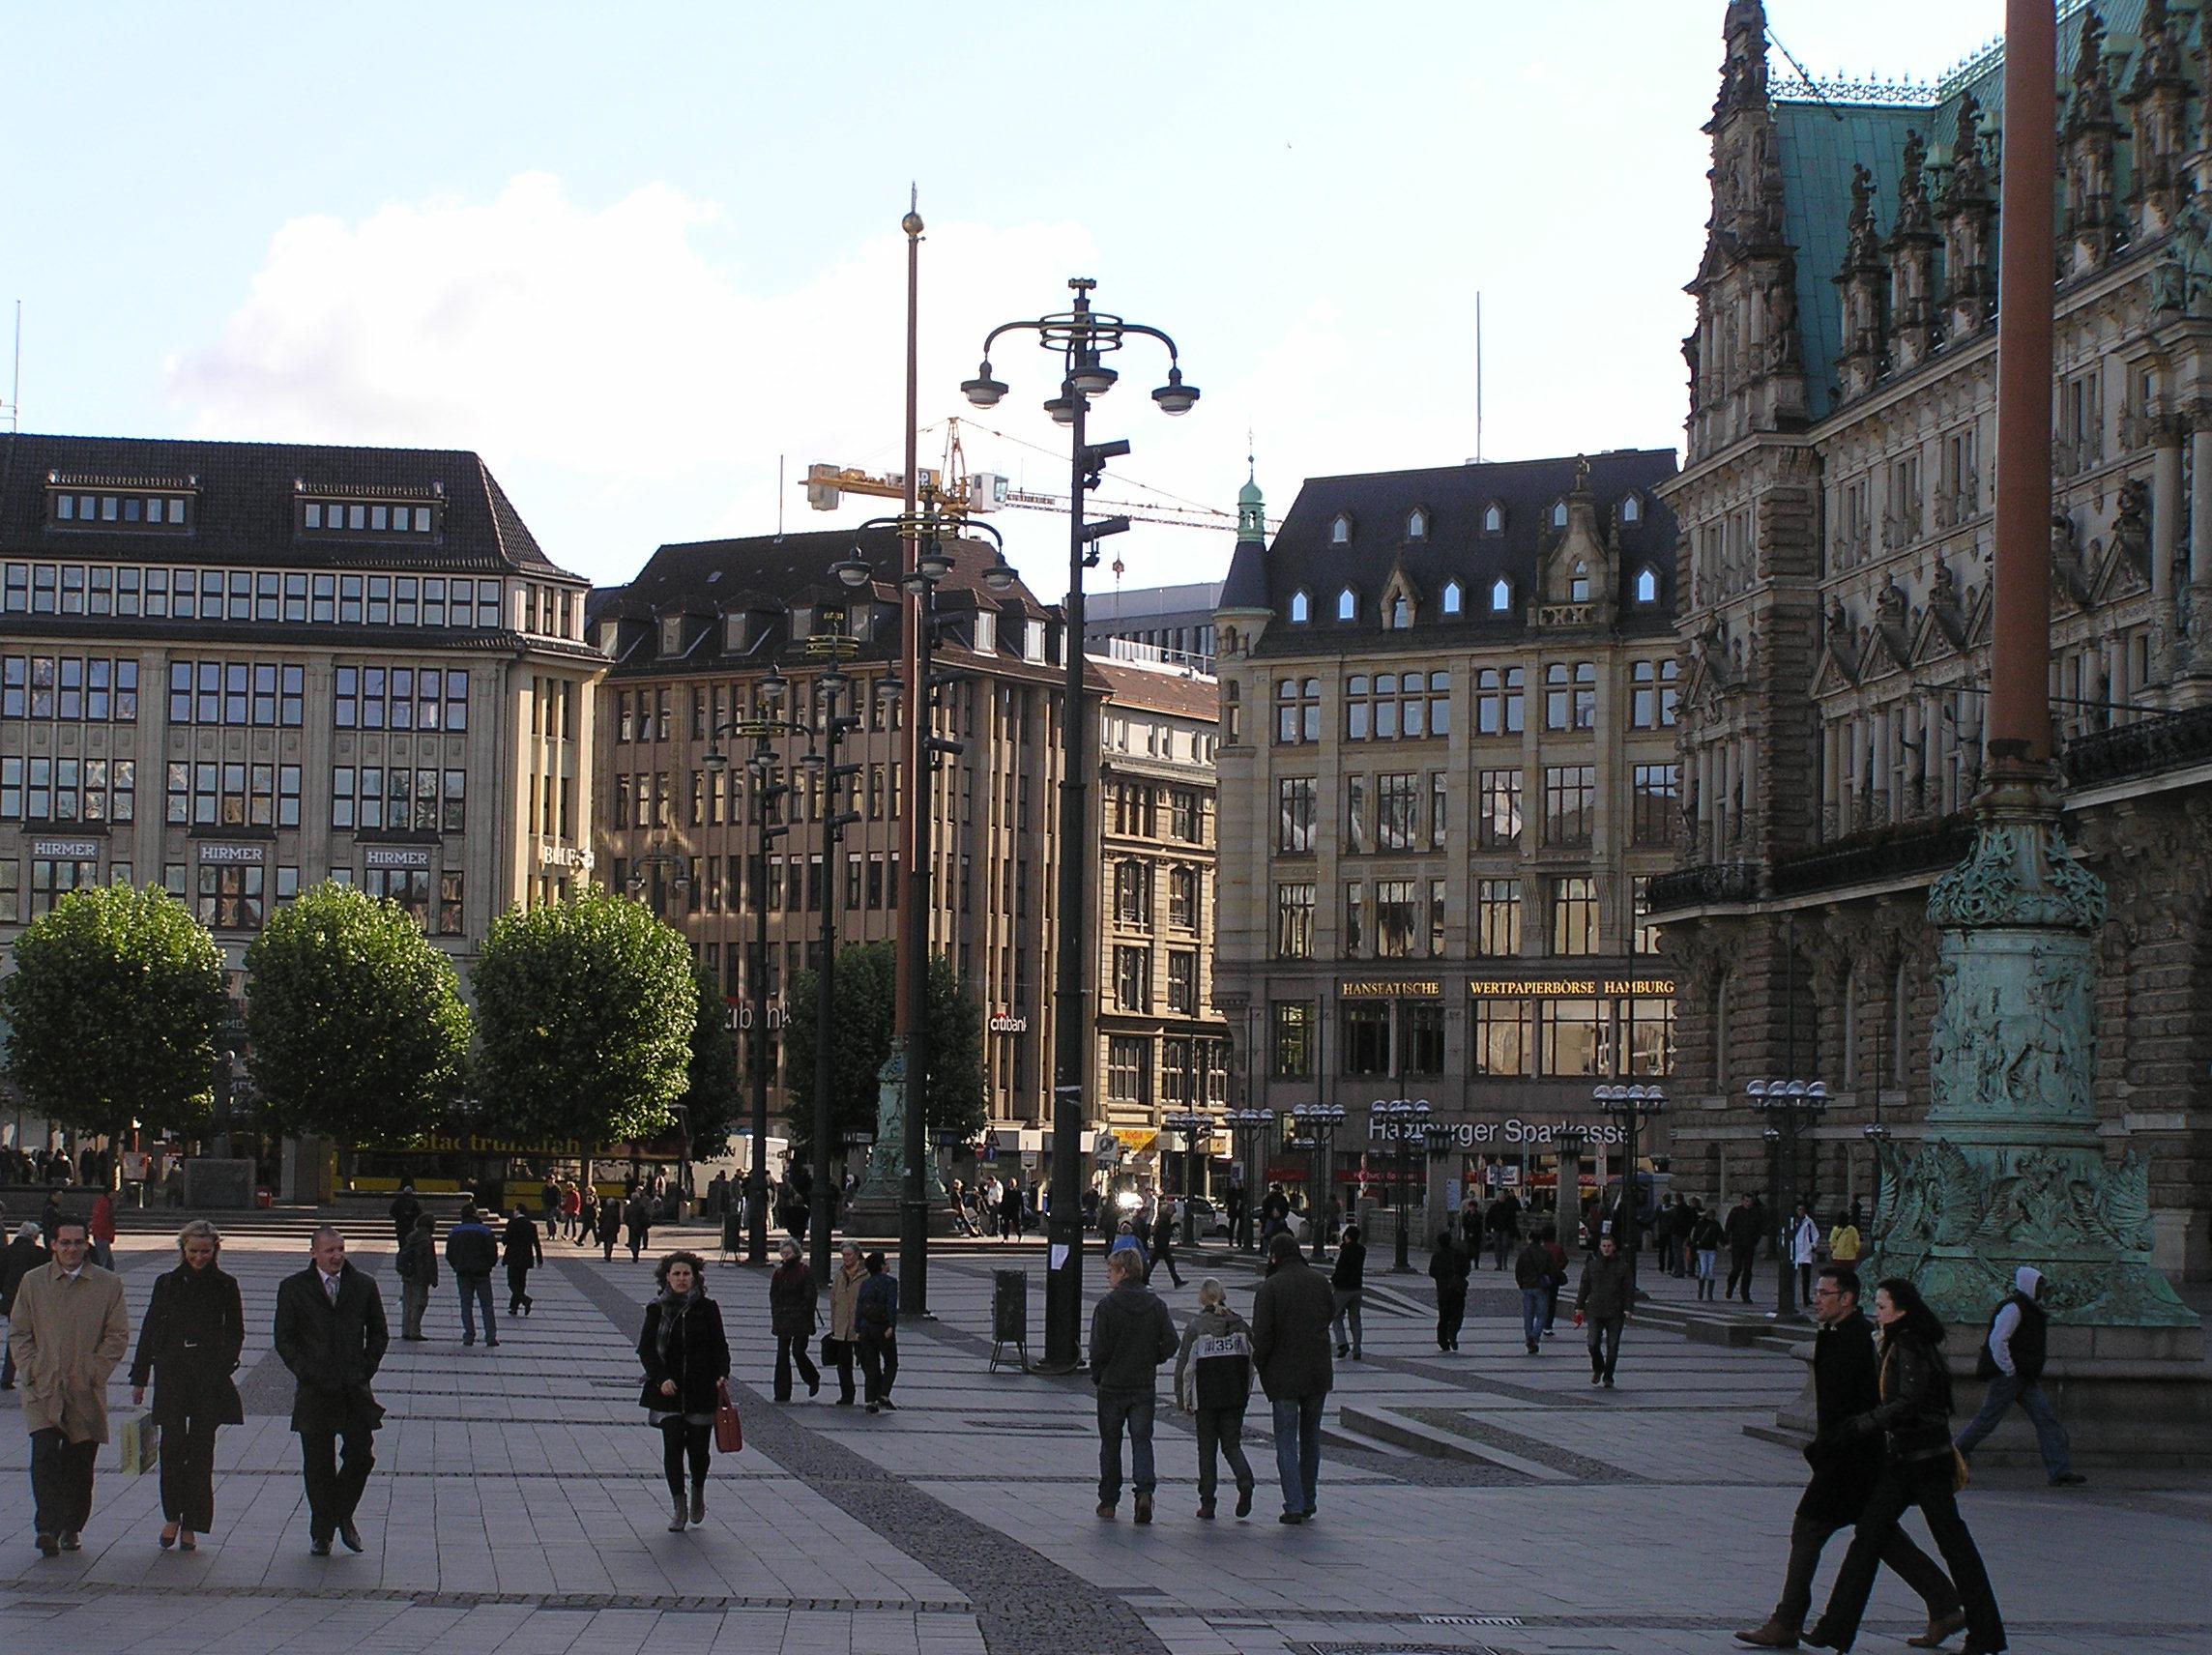 hamburg rathausmarkt 01 - Чарующее танго Танцующих башен